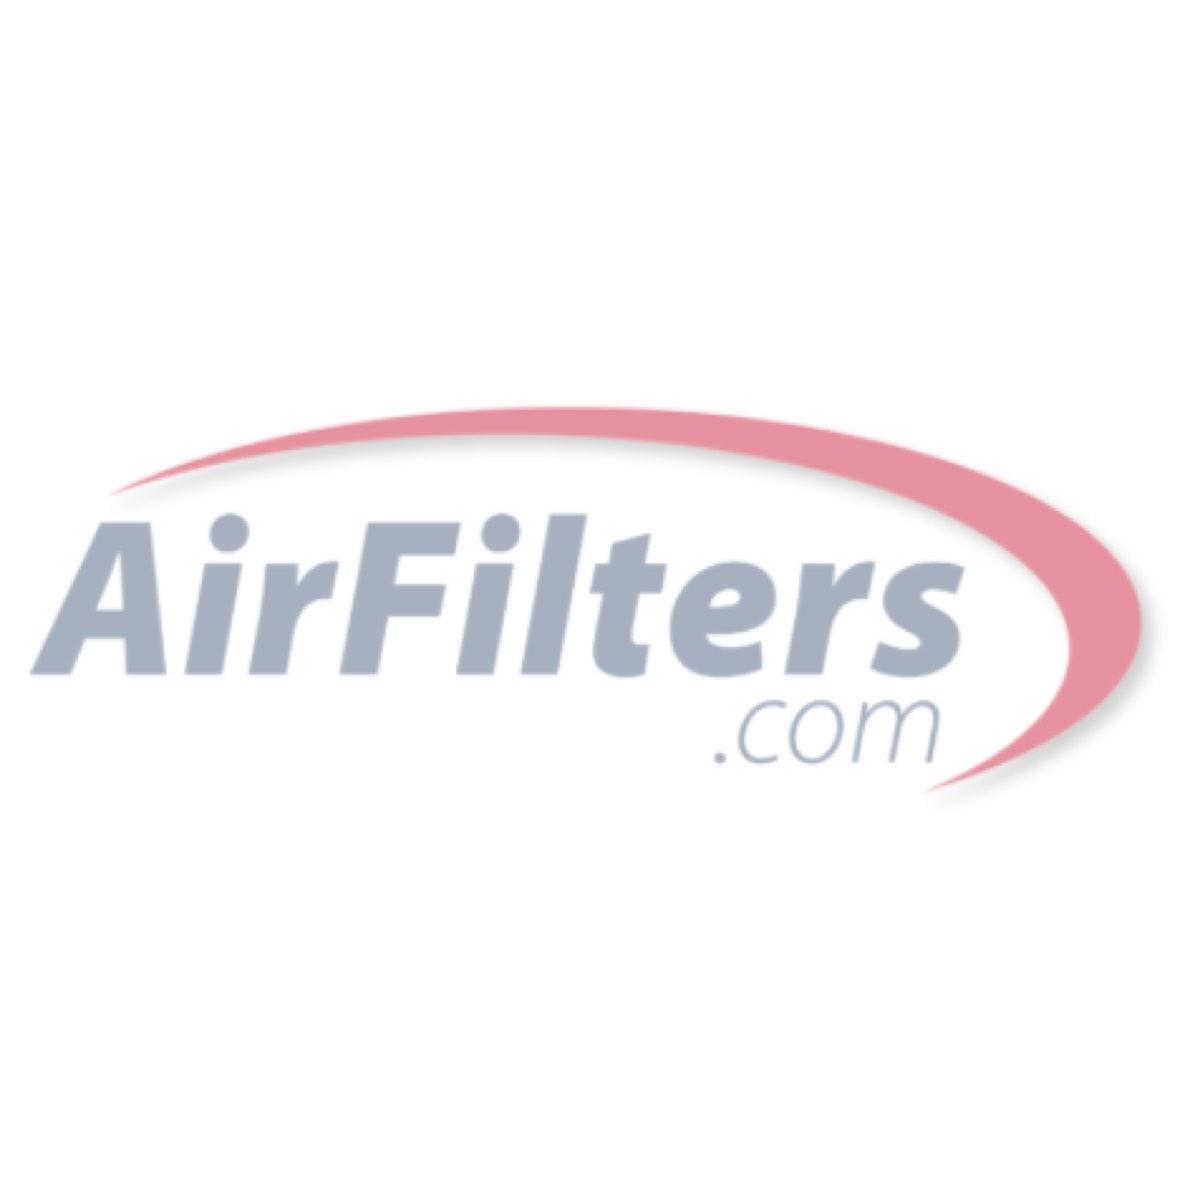 16x25x4.5 BDP® EZ Flex Filters by Accumulair®